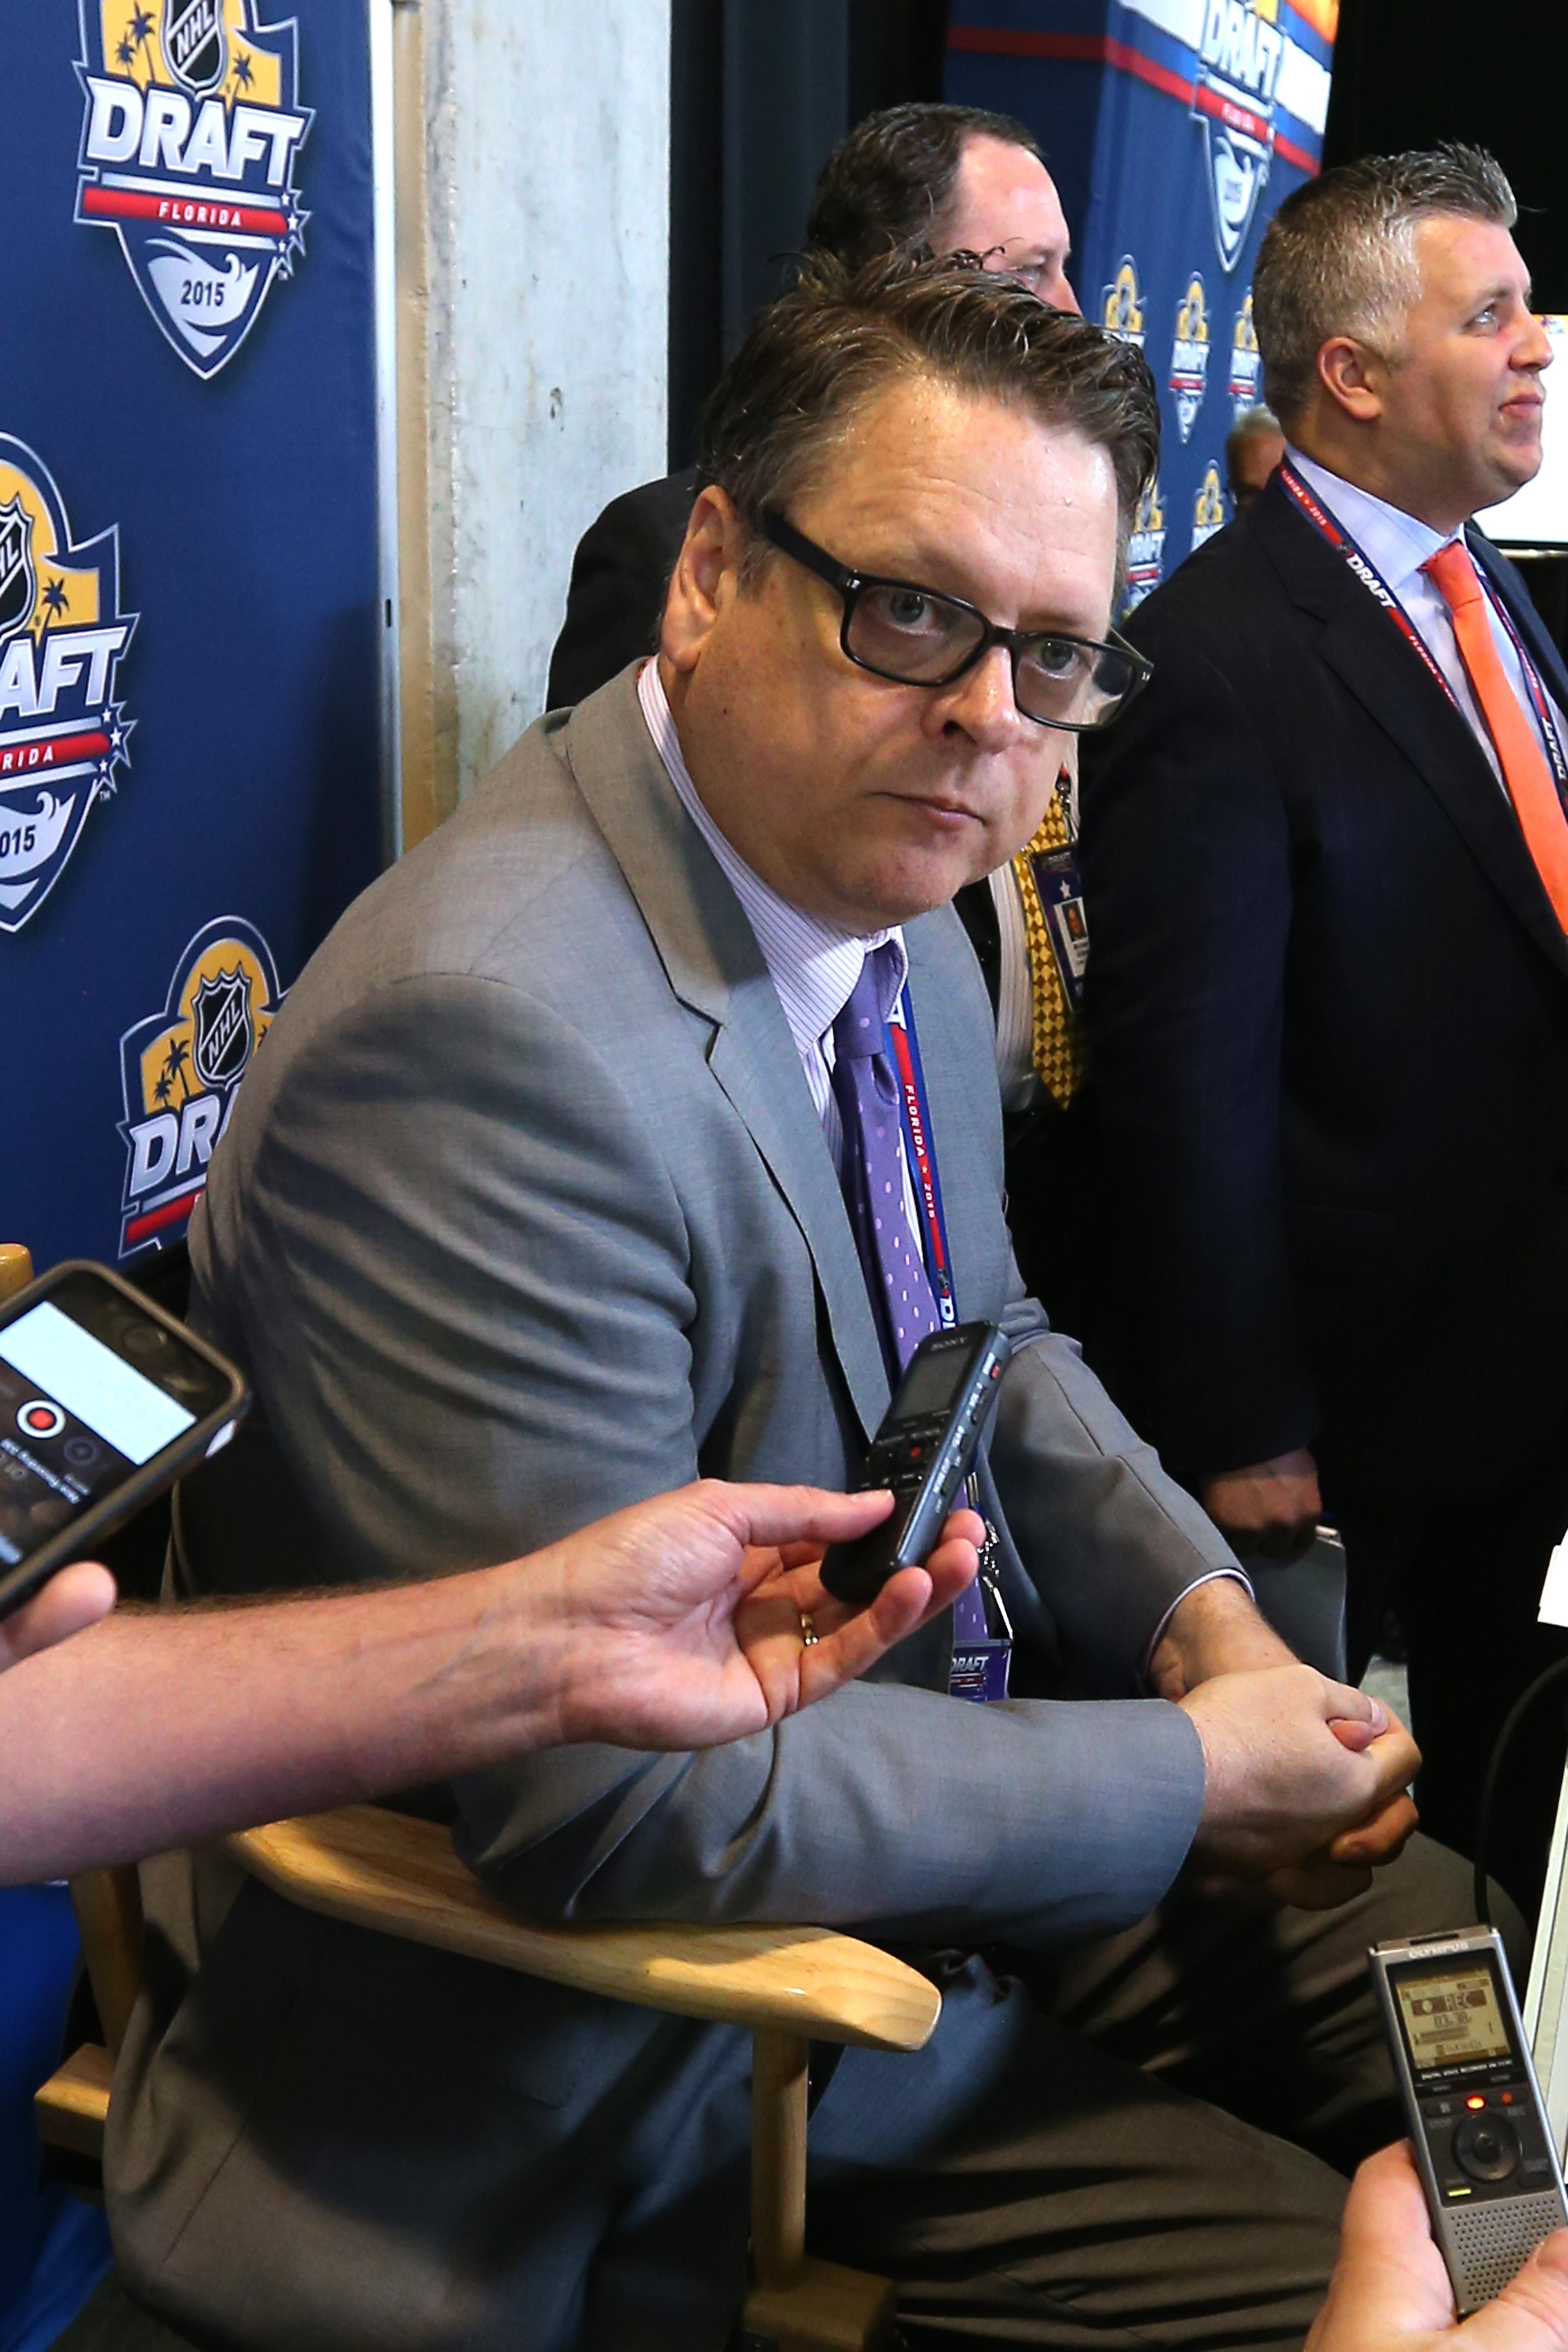 2015 NHL Draft - Rounds 2-7